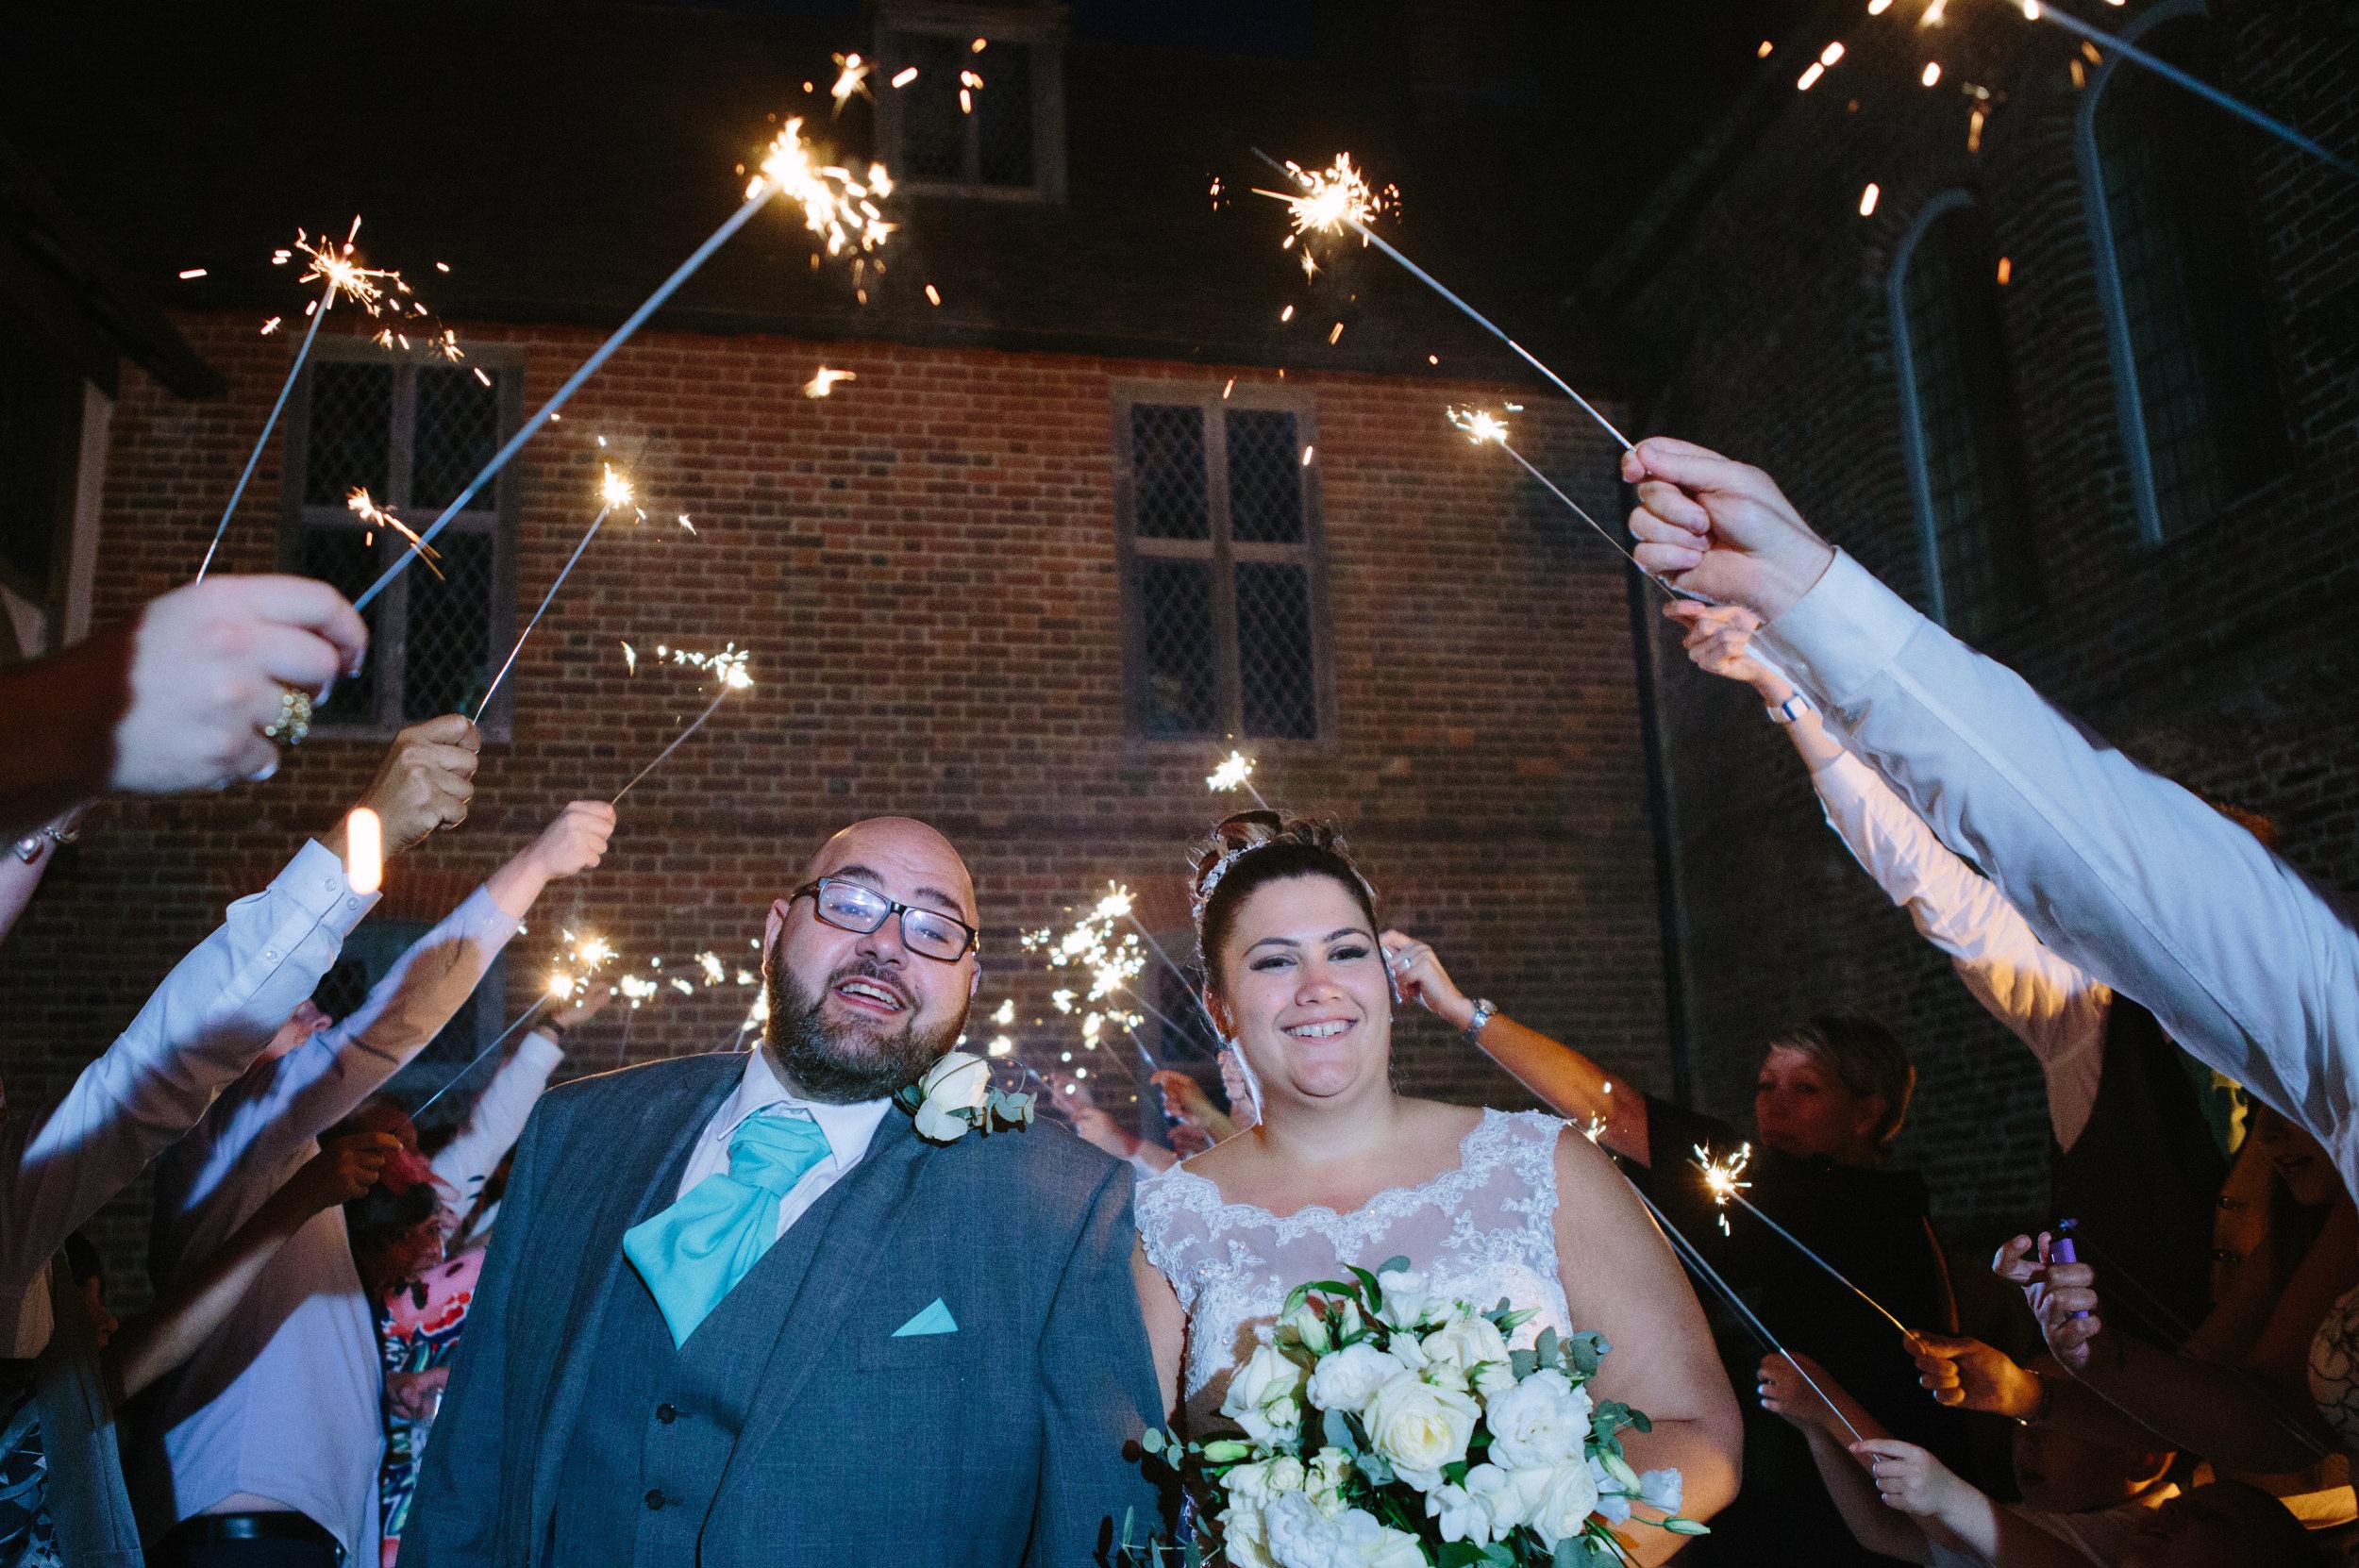 westenhangar-castle-kent-london-wedding-photography-sparklers-73